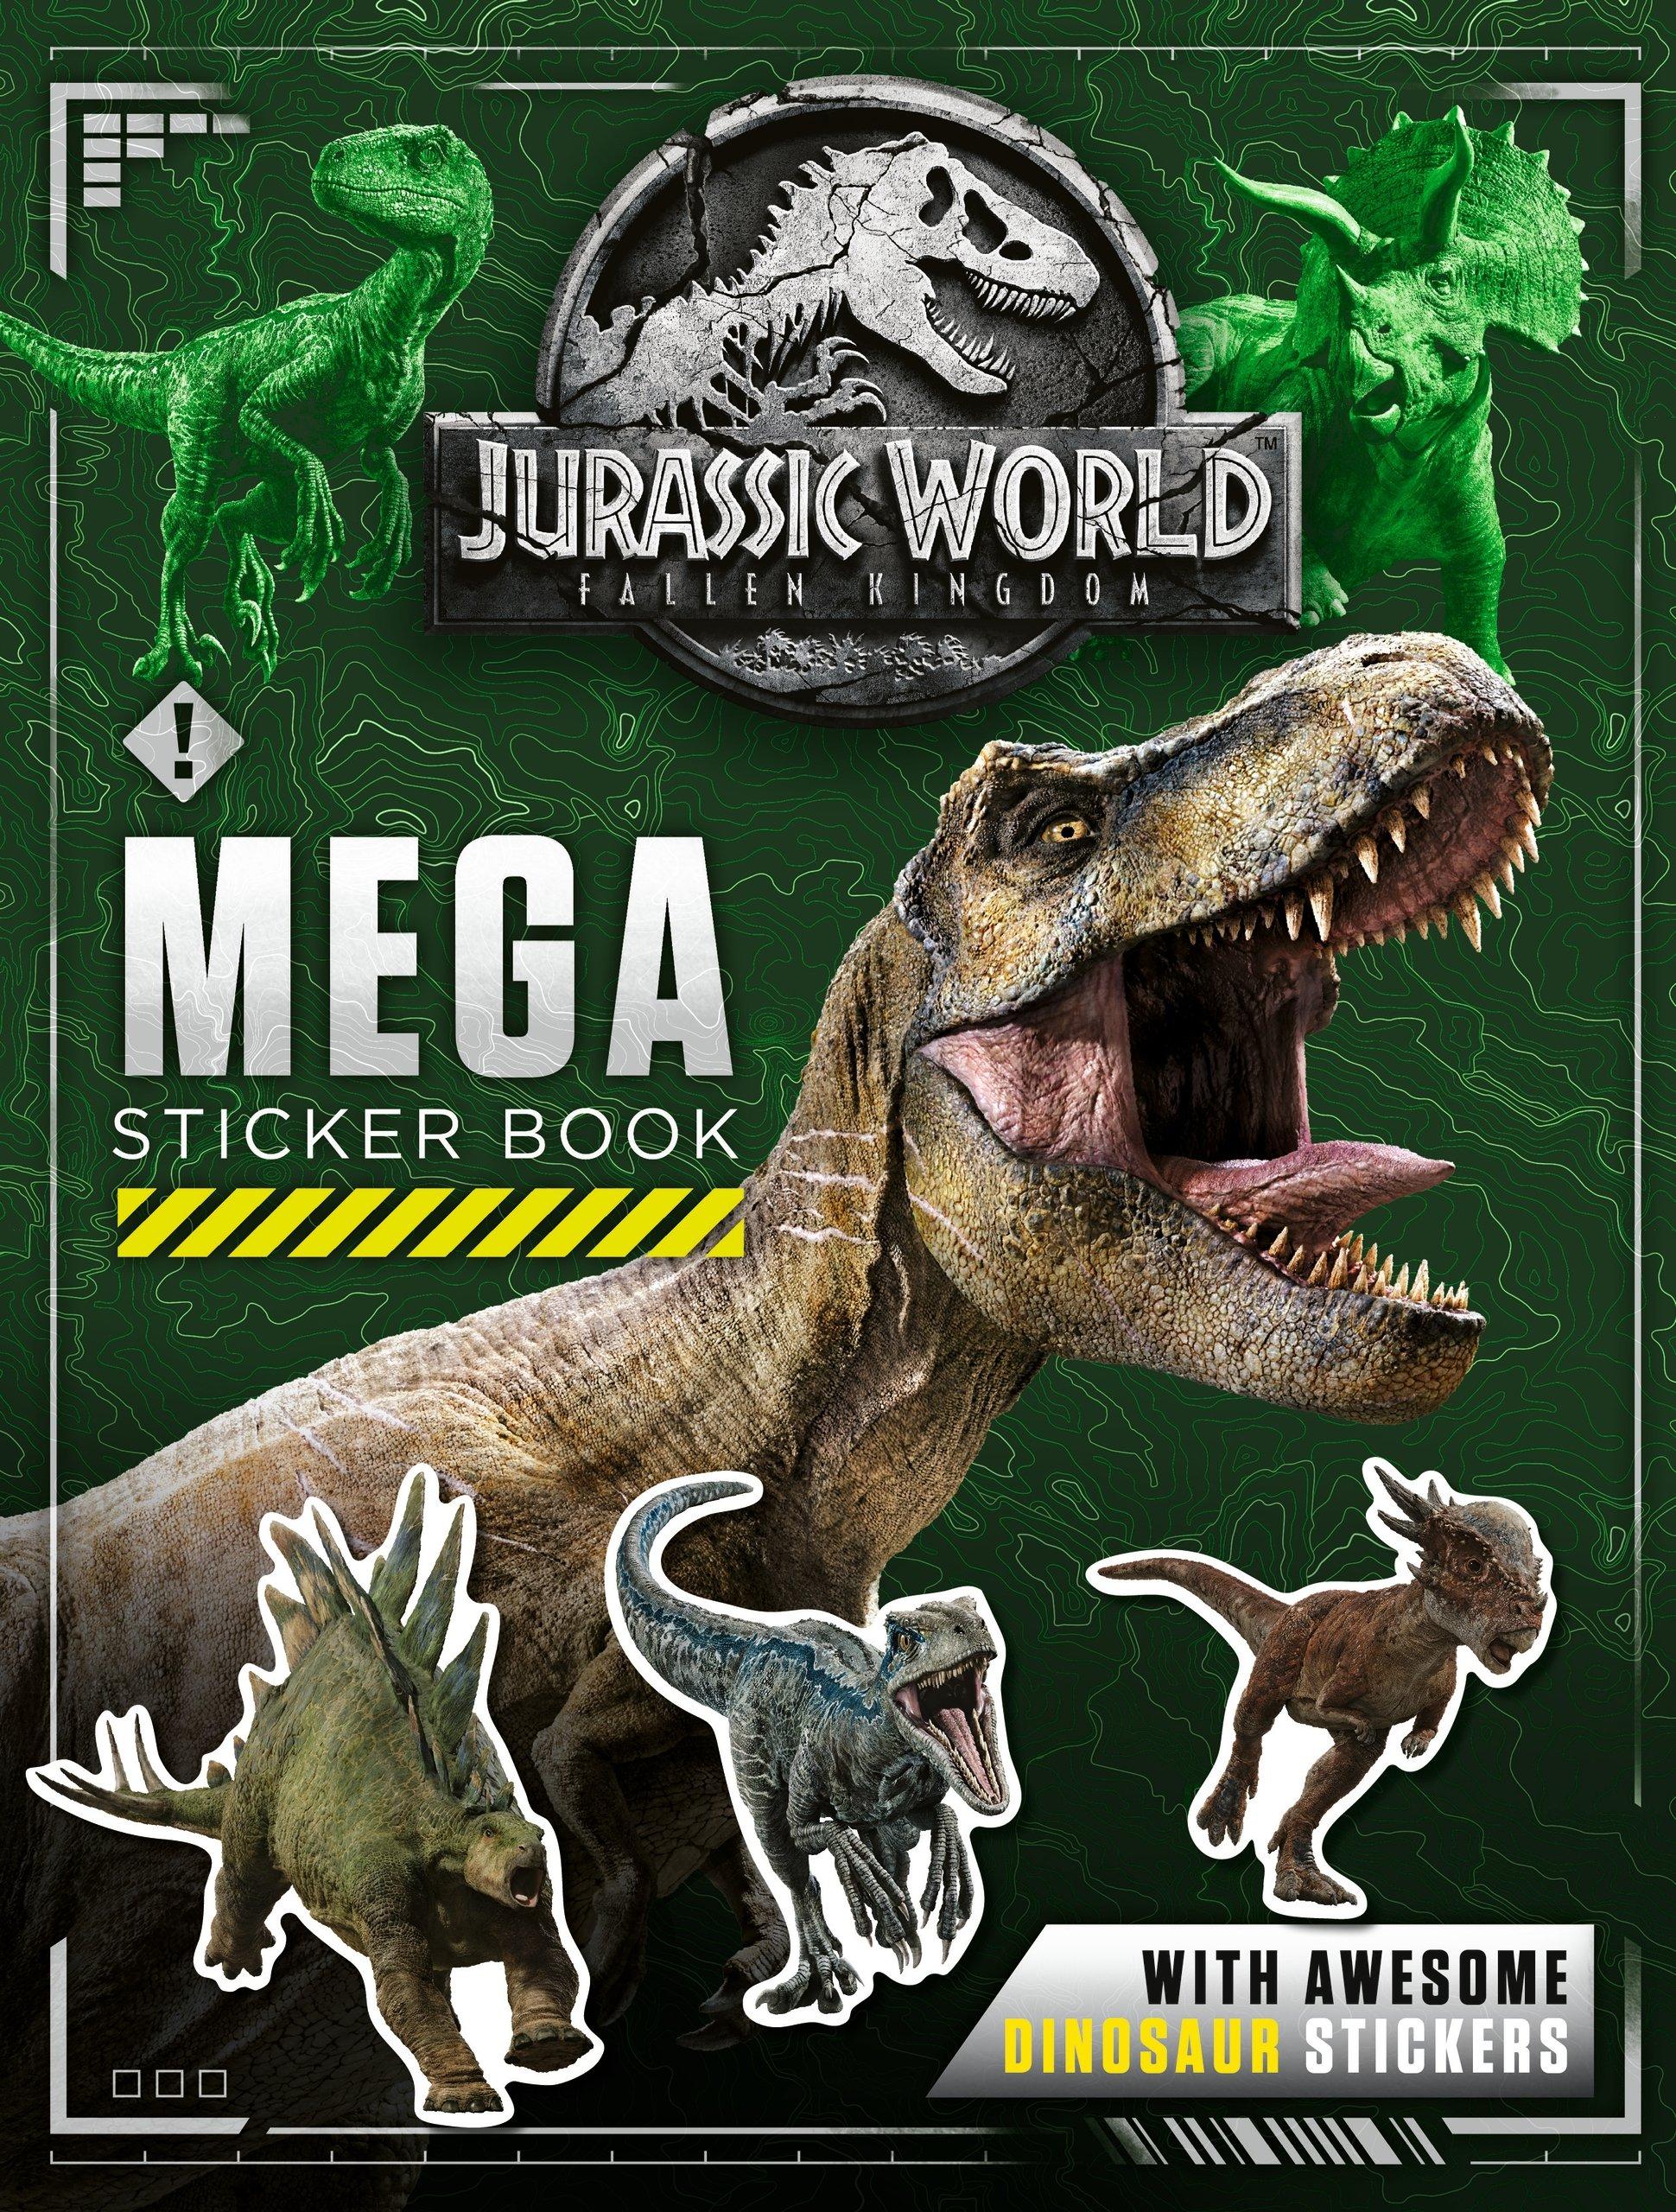 Jurassic World Fallen Kingdom Mega Sticker Book Sticker